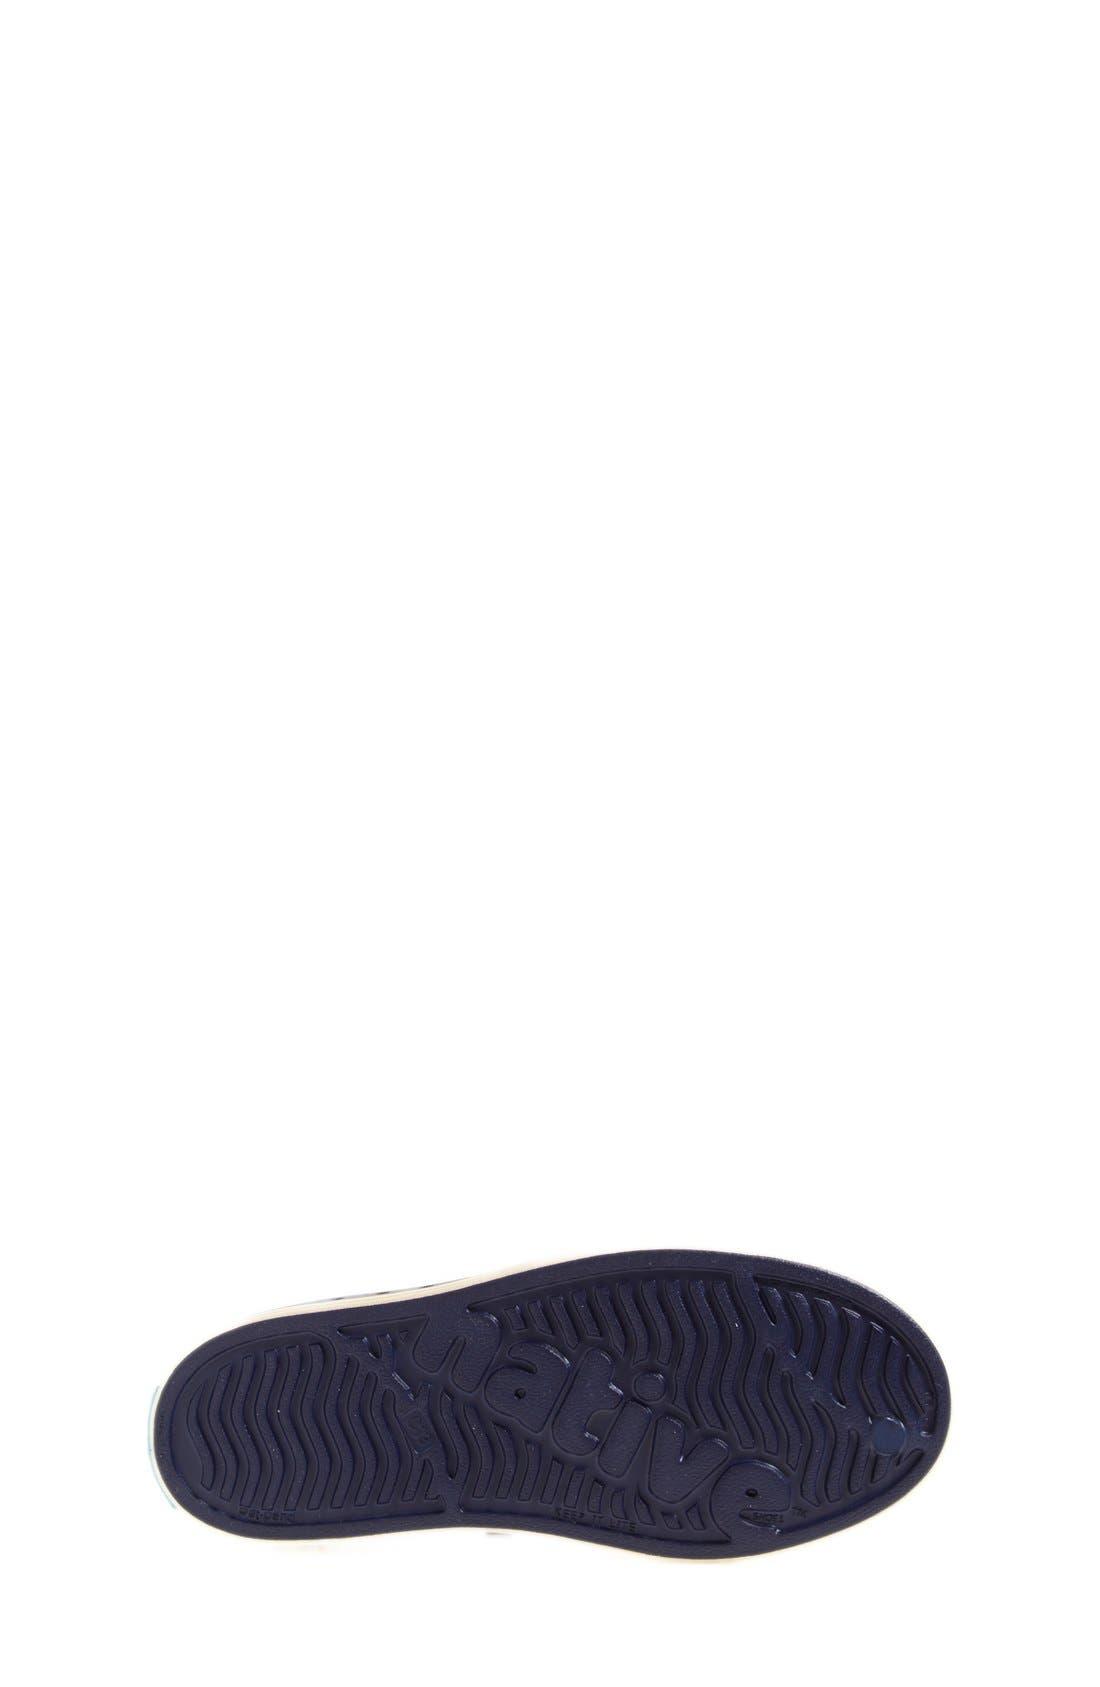 'Jefferson' Water Friendly Slip-On Sneaker,                             Alternate thumbnail 203, color,